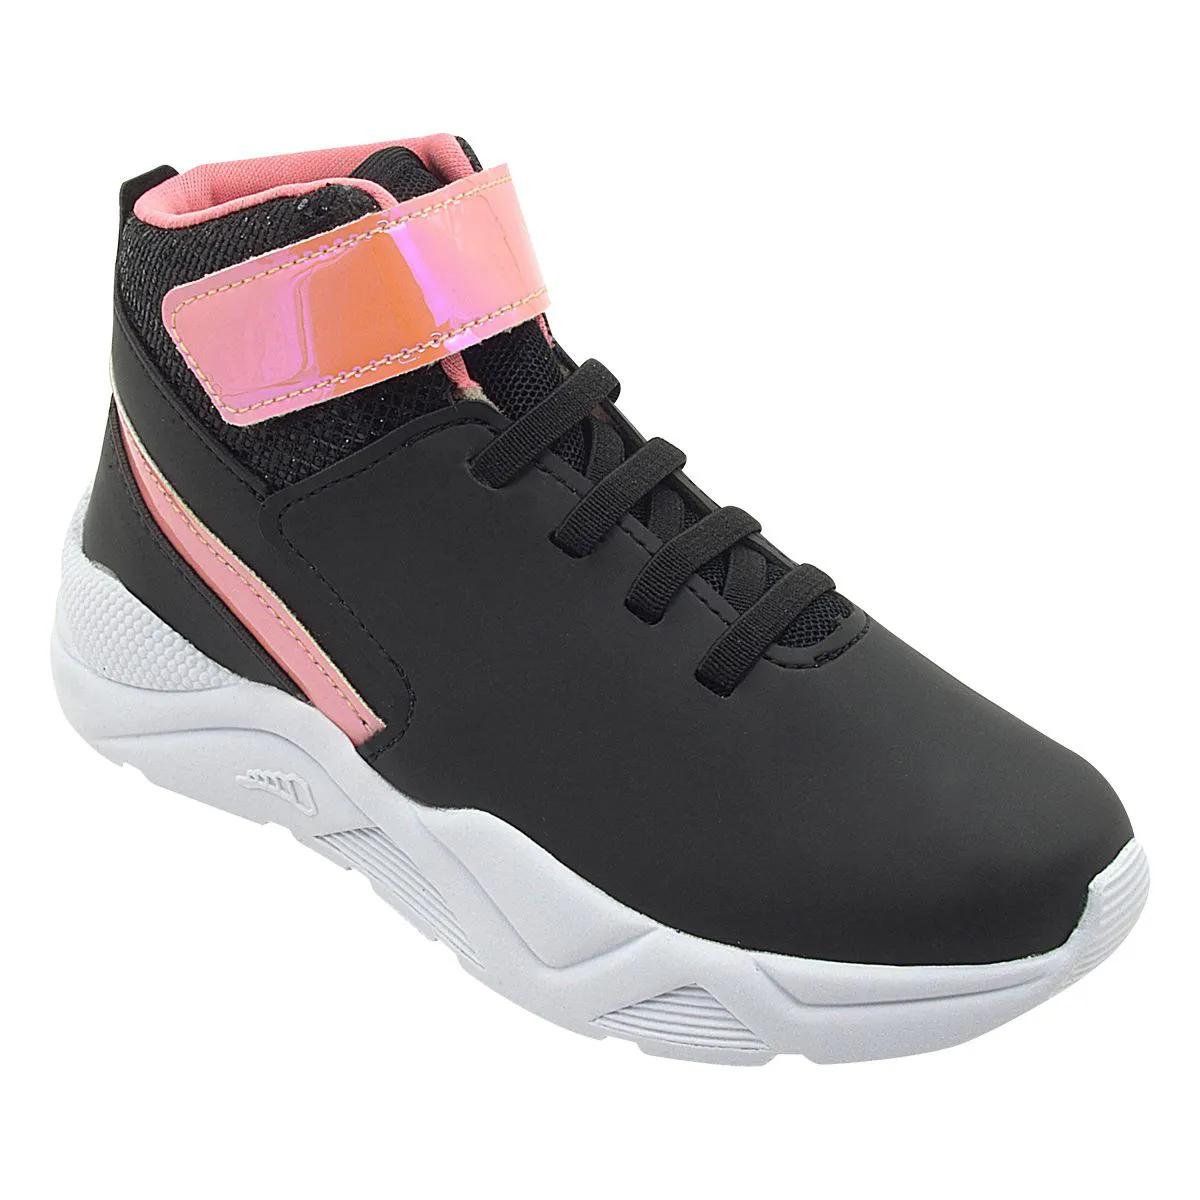 Tênis Infantil Sneaker Cano Alto Preto e Rosa Feminino